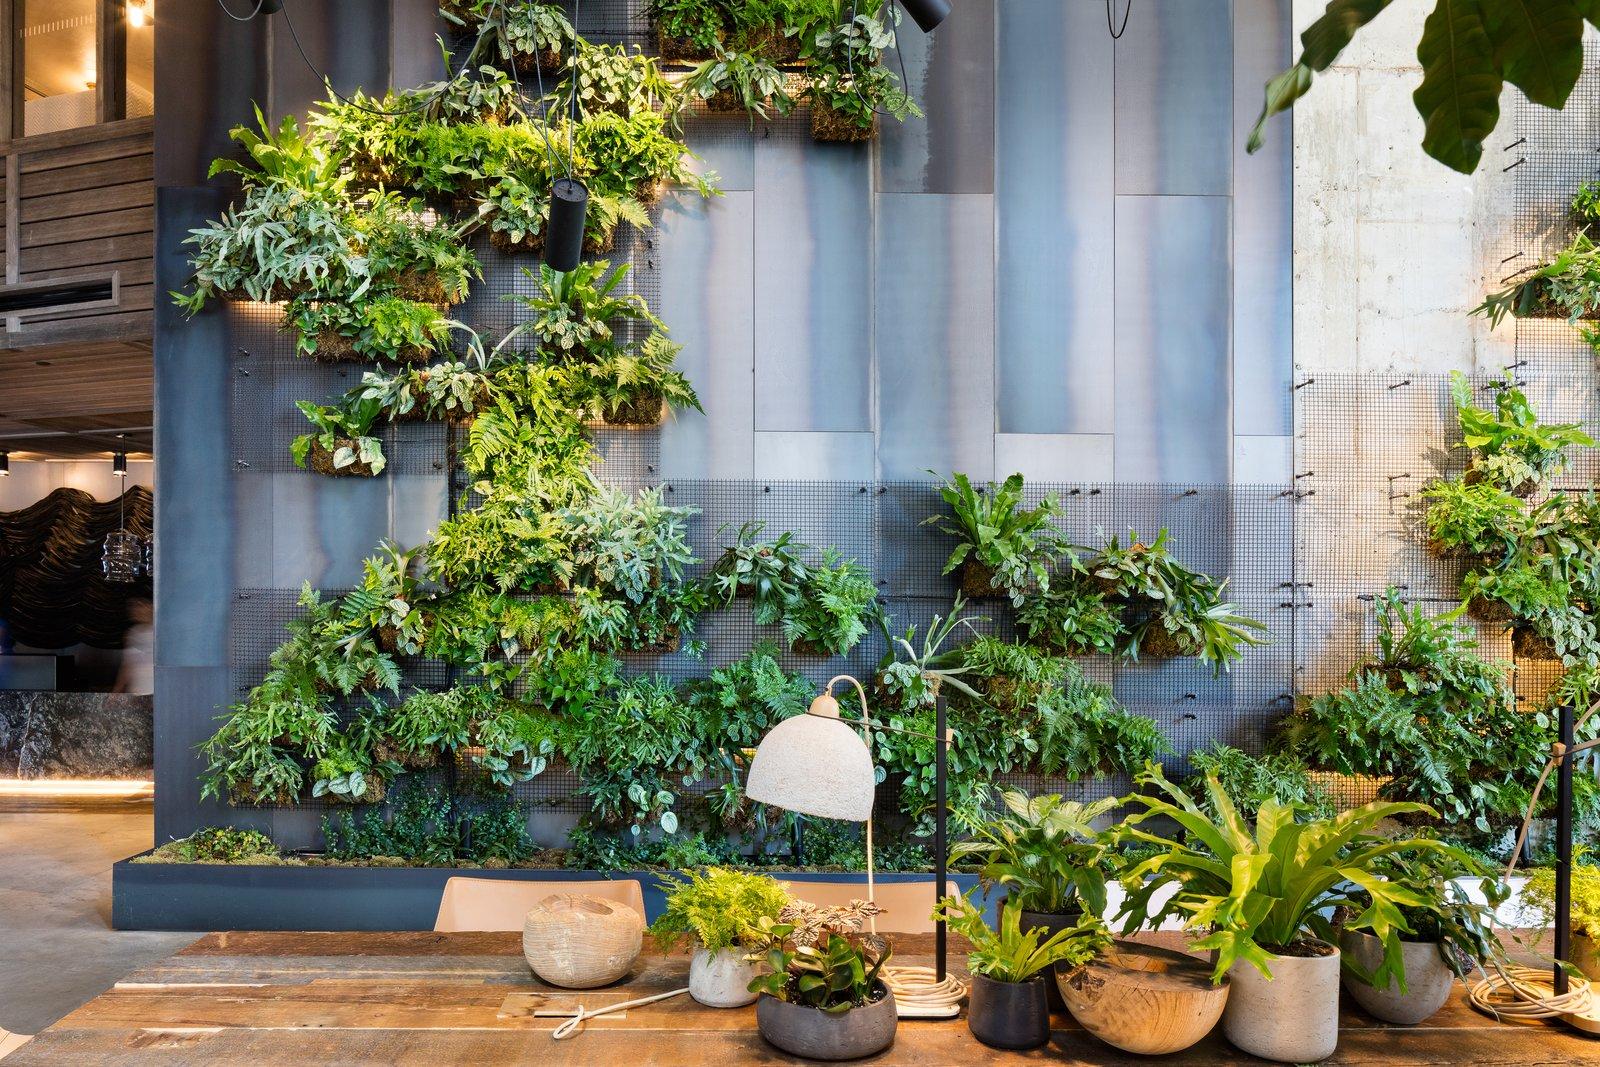 Mur de vie vertical dans l'hôtel Brooklyn Bridge